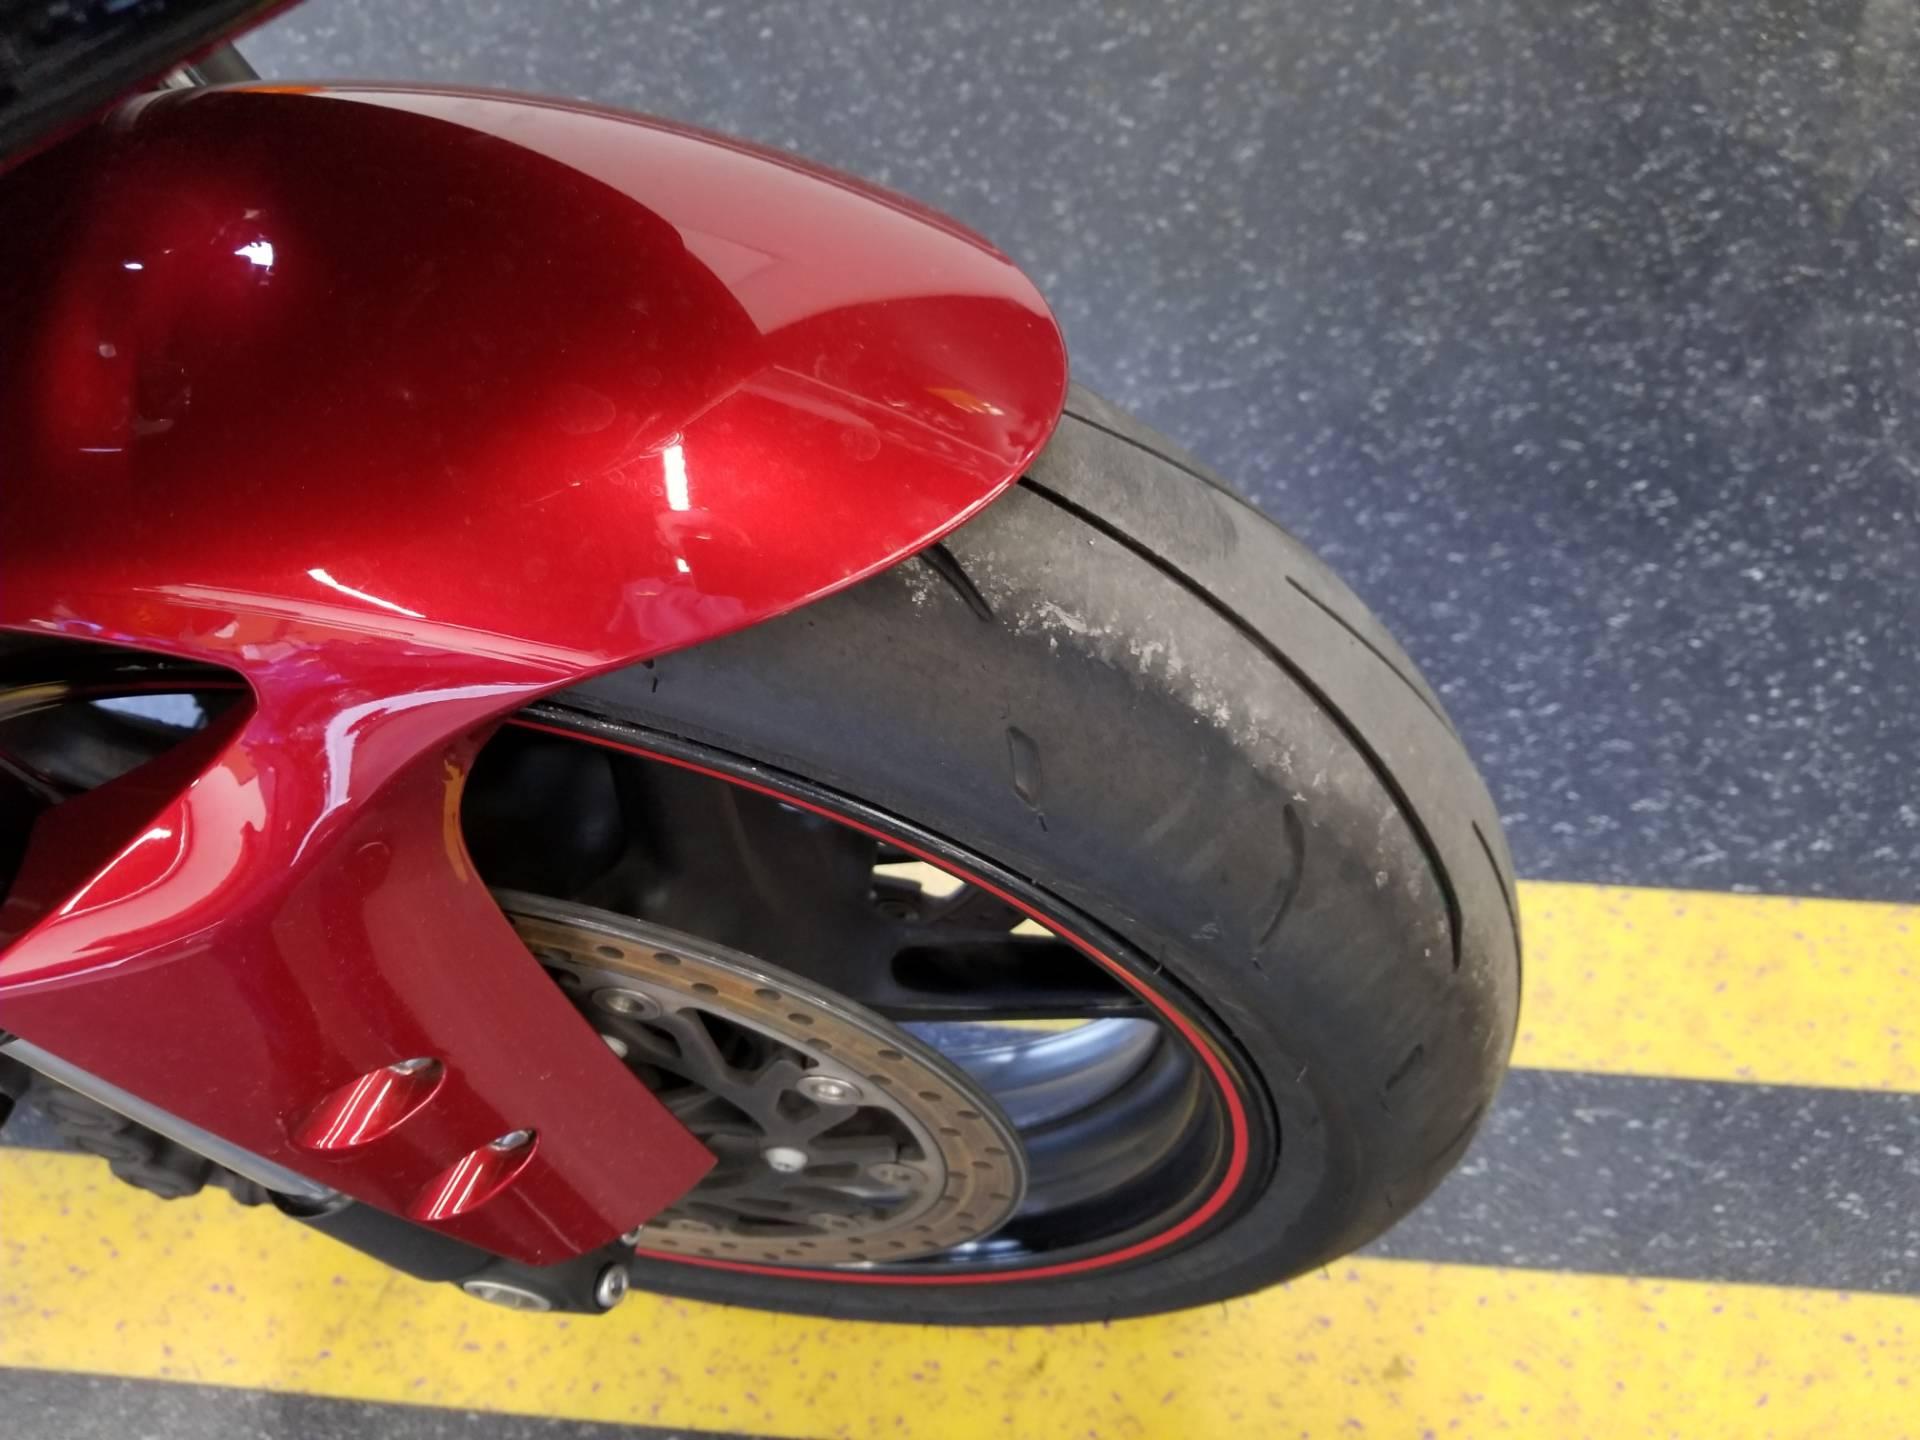 2011 Yamaha YZF-R1 7